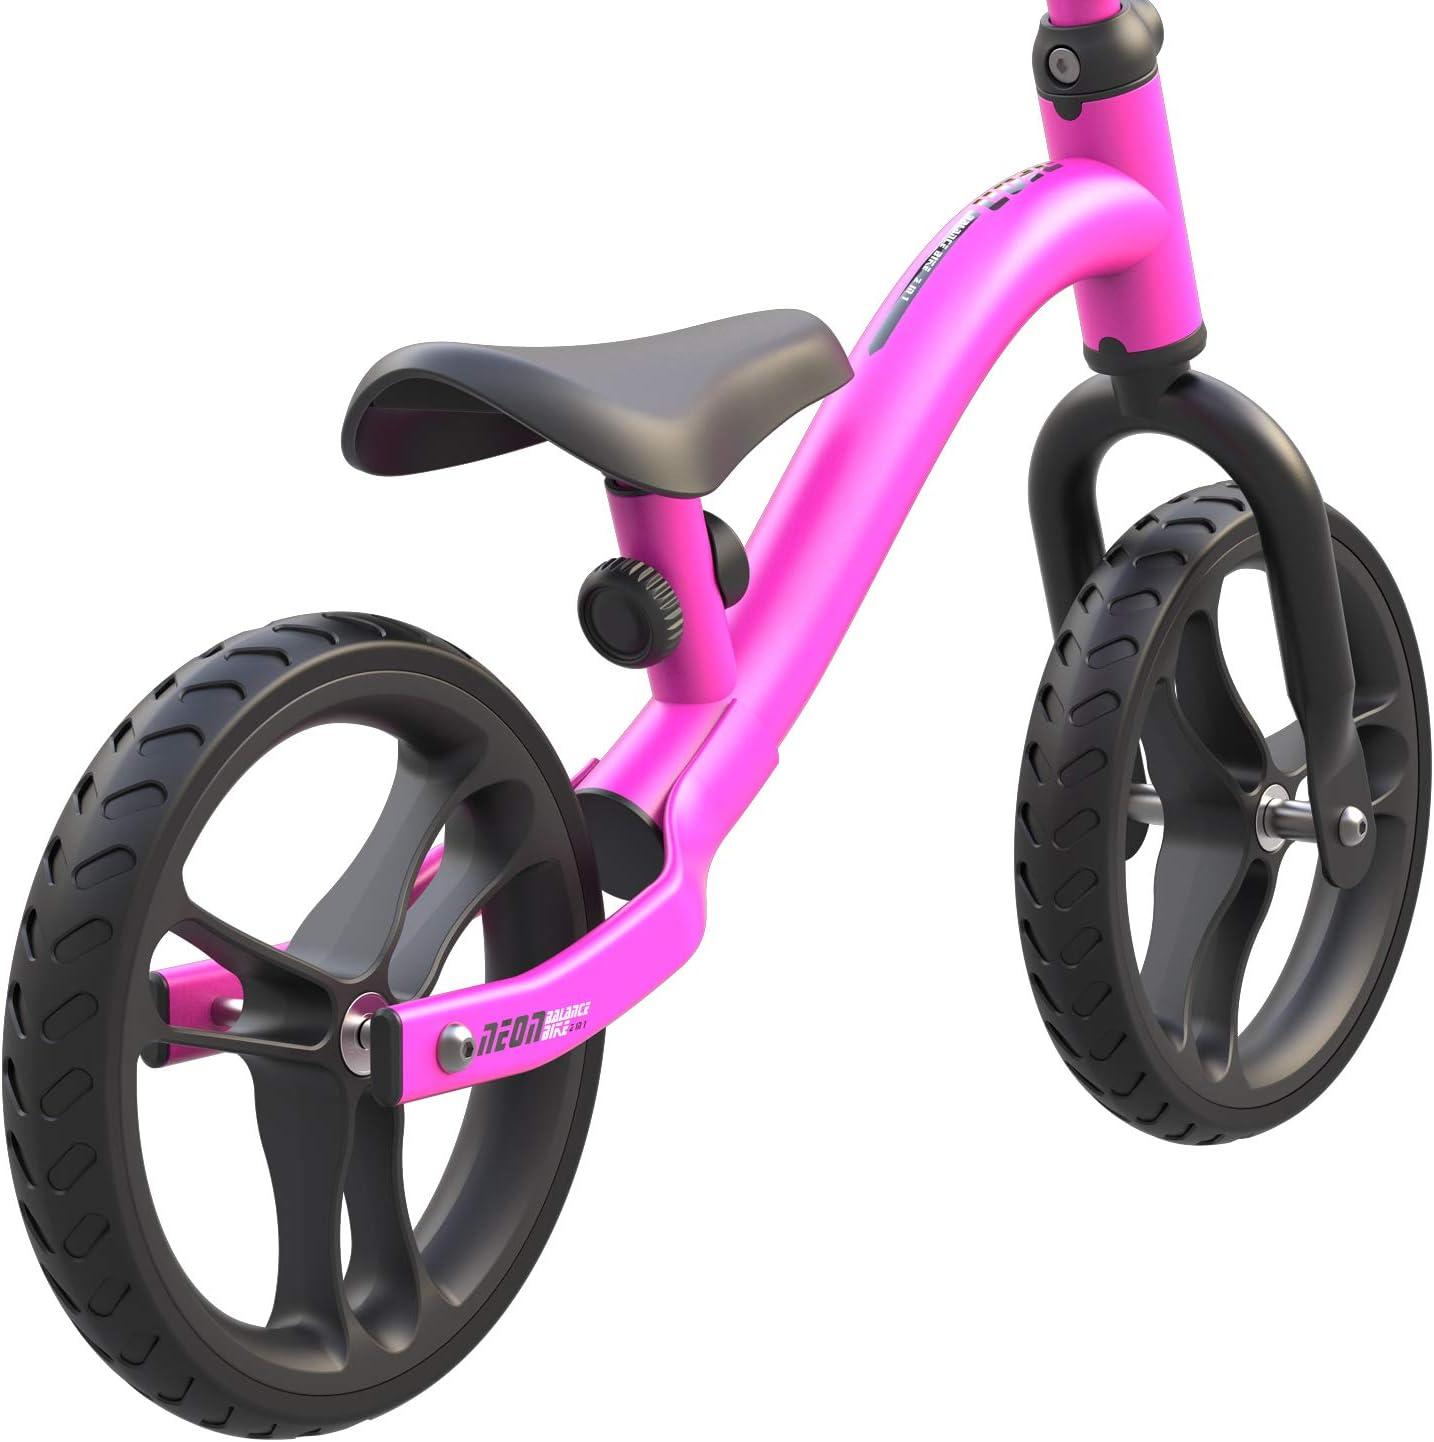 Yvolution Neon 2-in-1 Balance Bike Ages 2-4 No-Pedal 9 Balance Bike